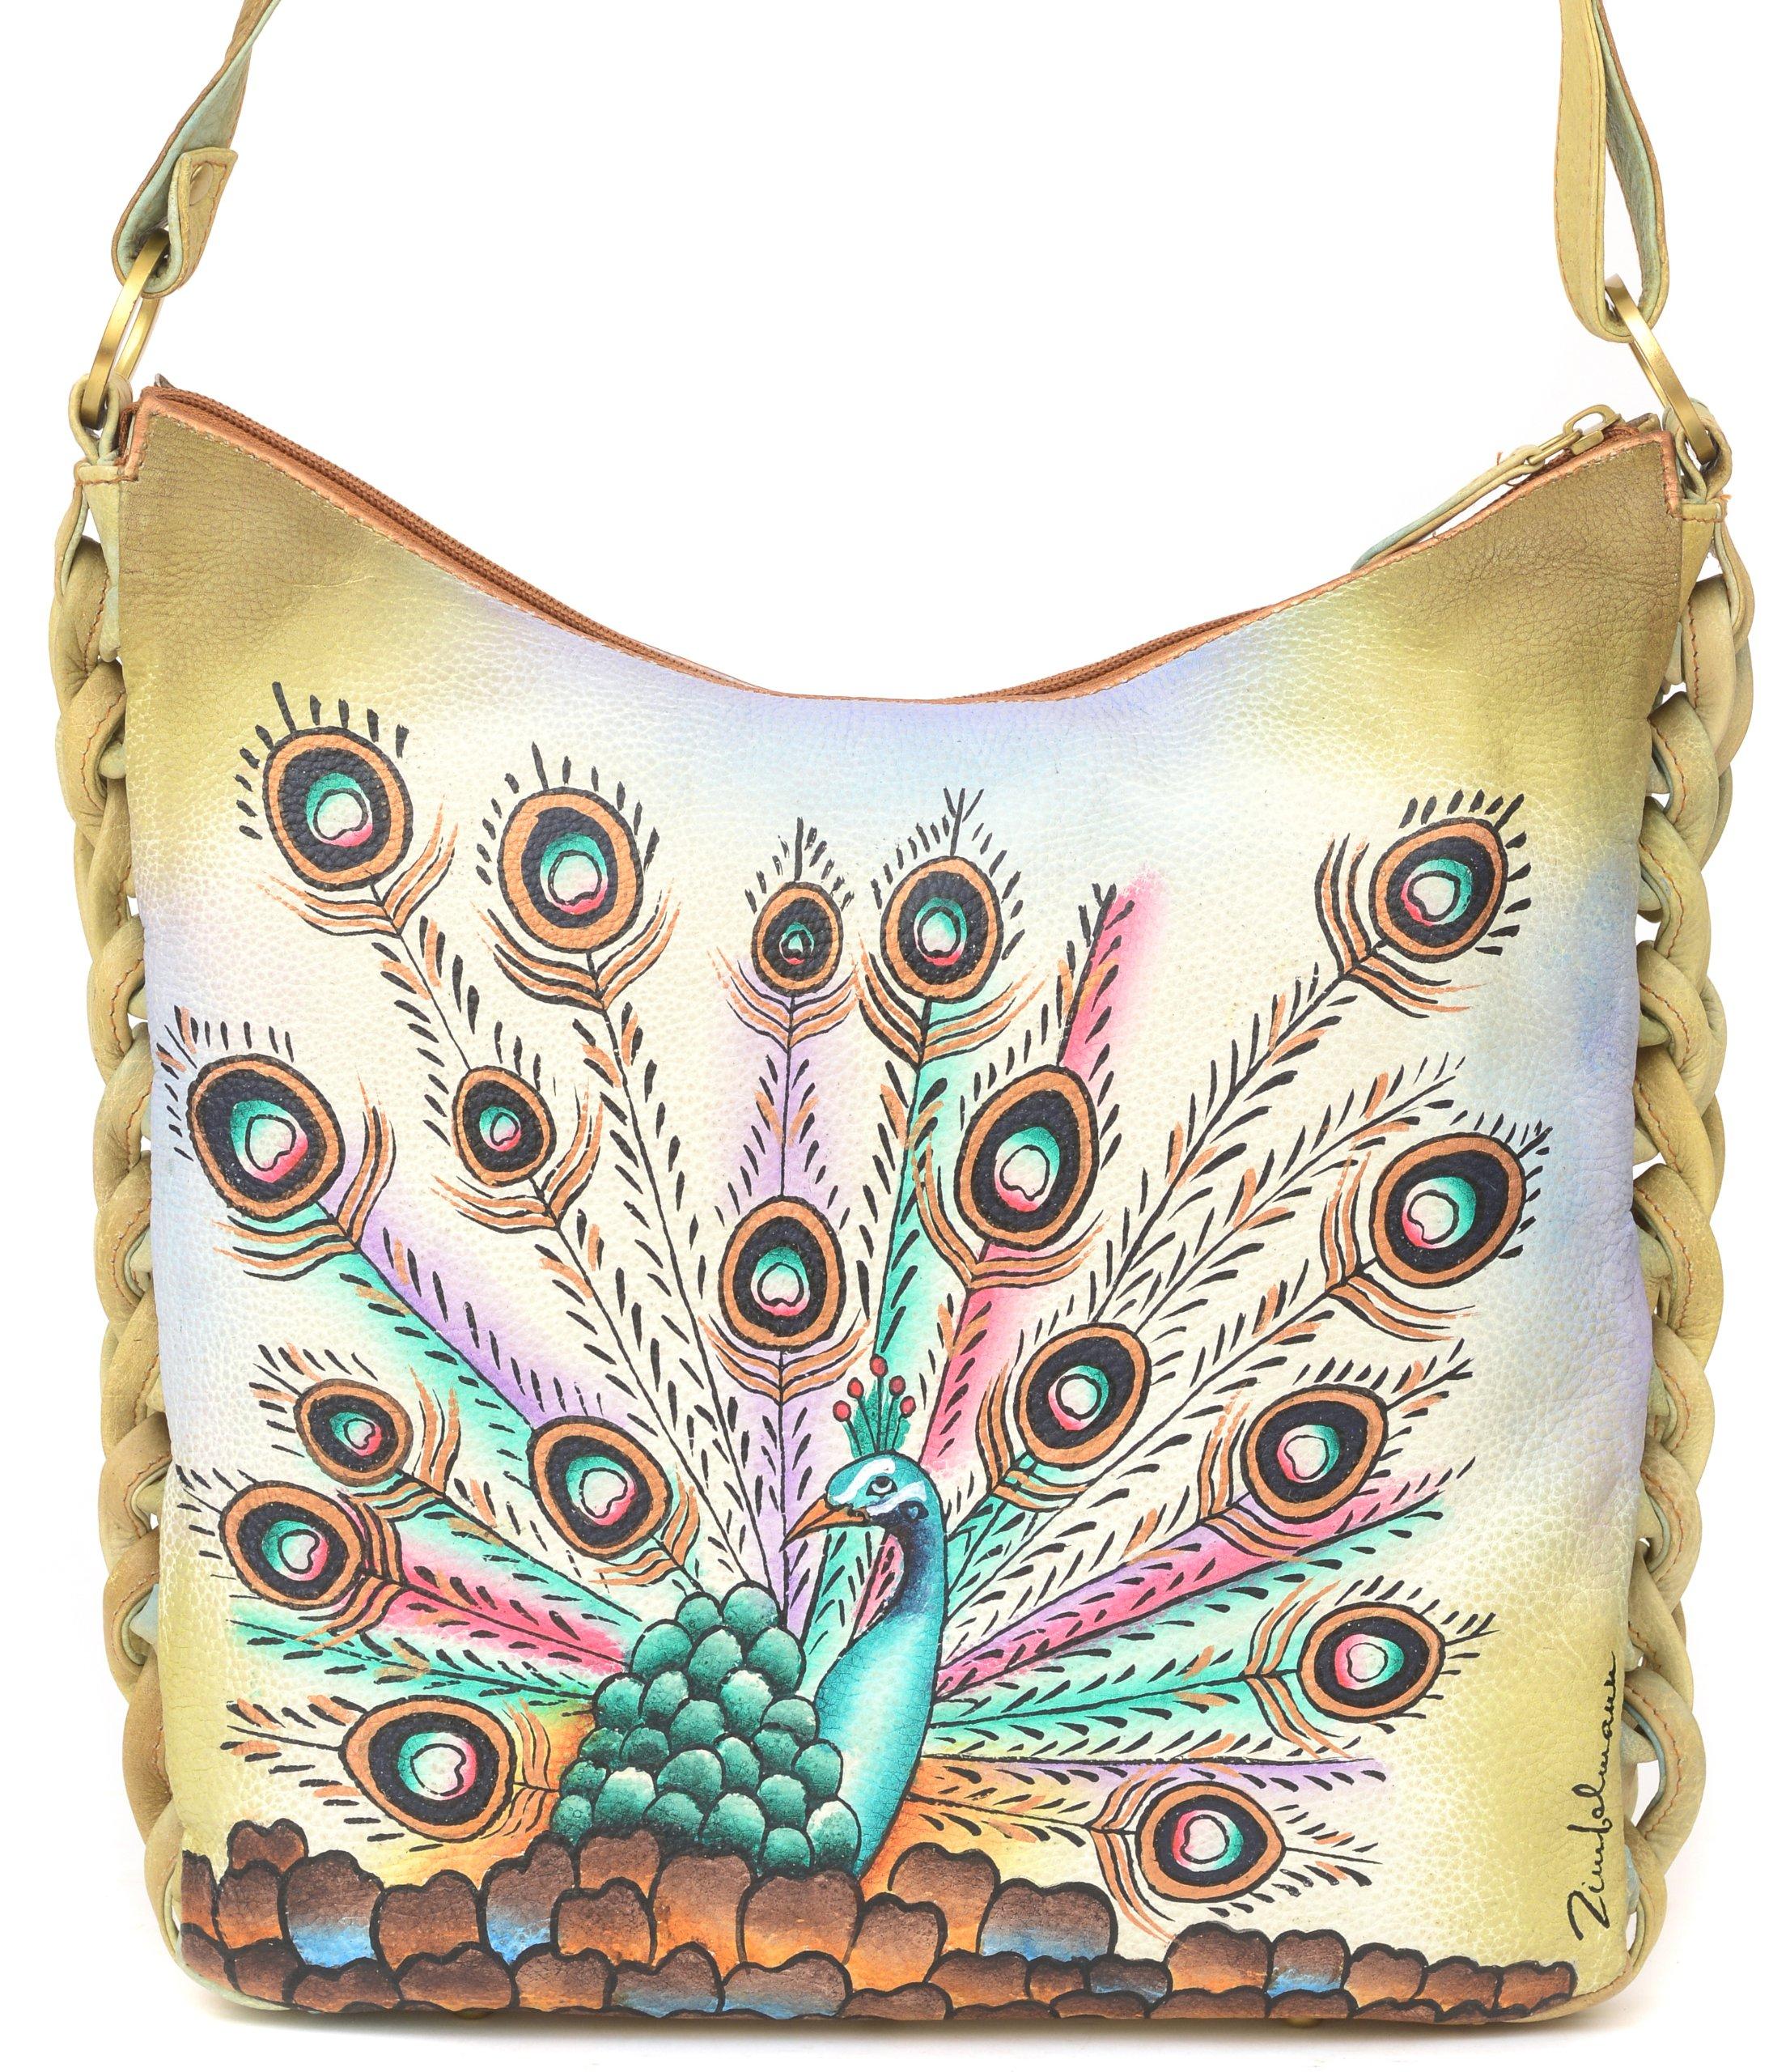 ZIMBELMANN BELLA Genuine Nappa Leather Hand-painted Hobo Shoulder Bag